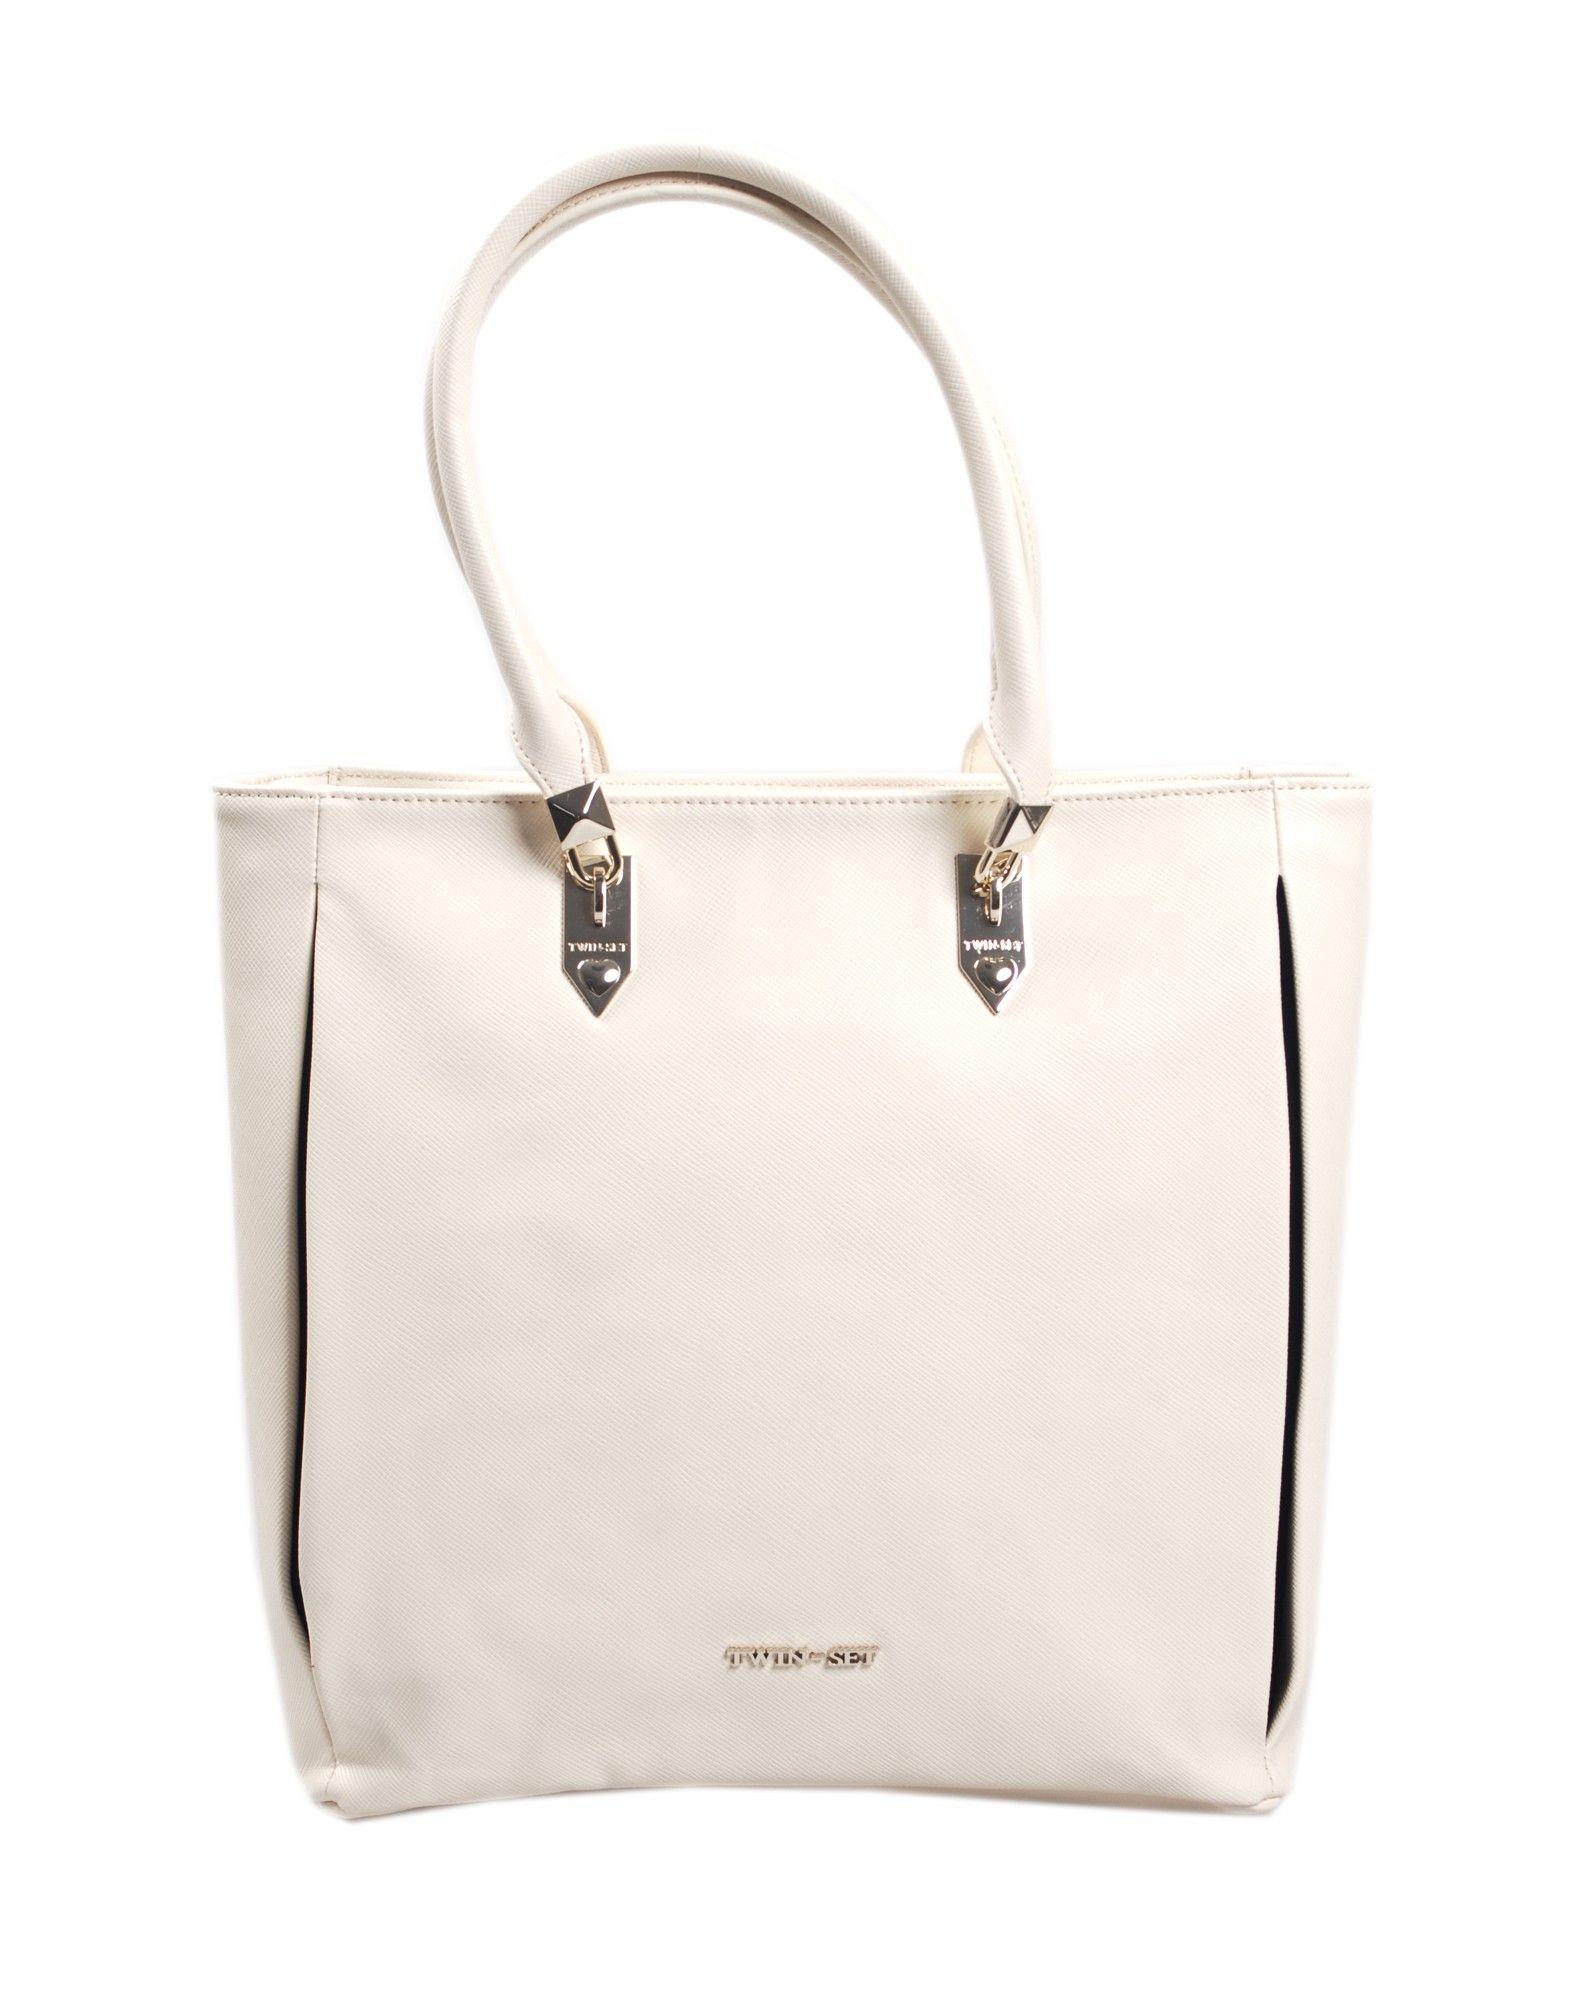 Borsa shopping TWIN SET by SIMONA BARBIERI in ecopelle colore cipria, chiusura a zip, interno foderato con logo e tasca a zip, manici.